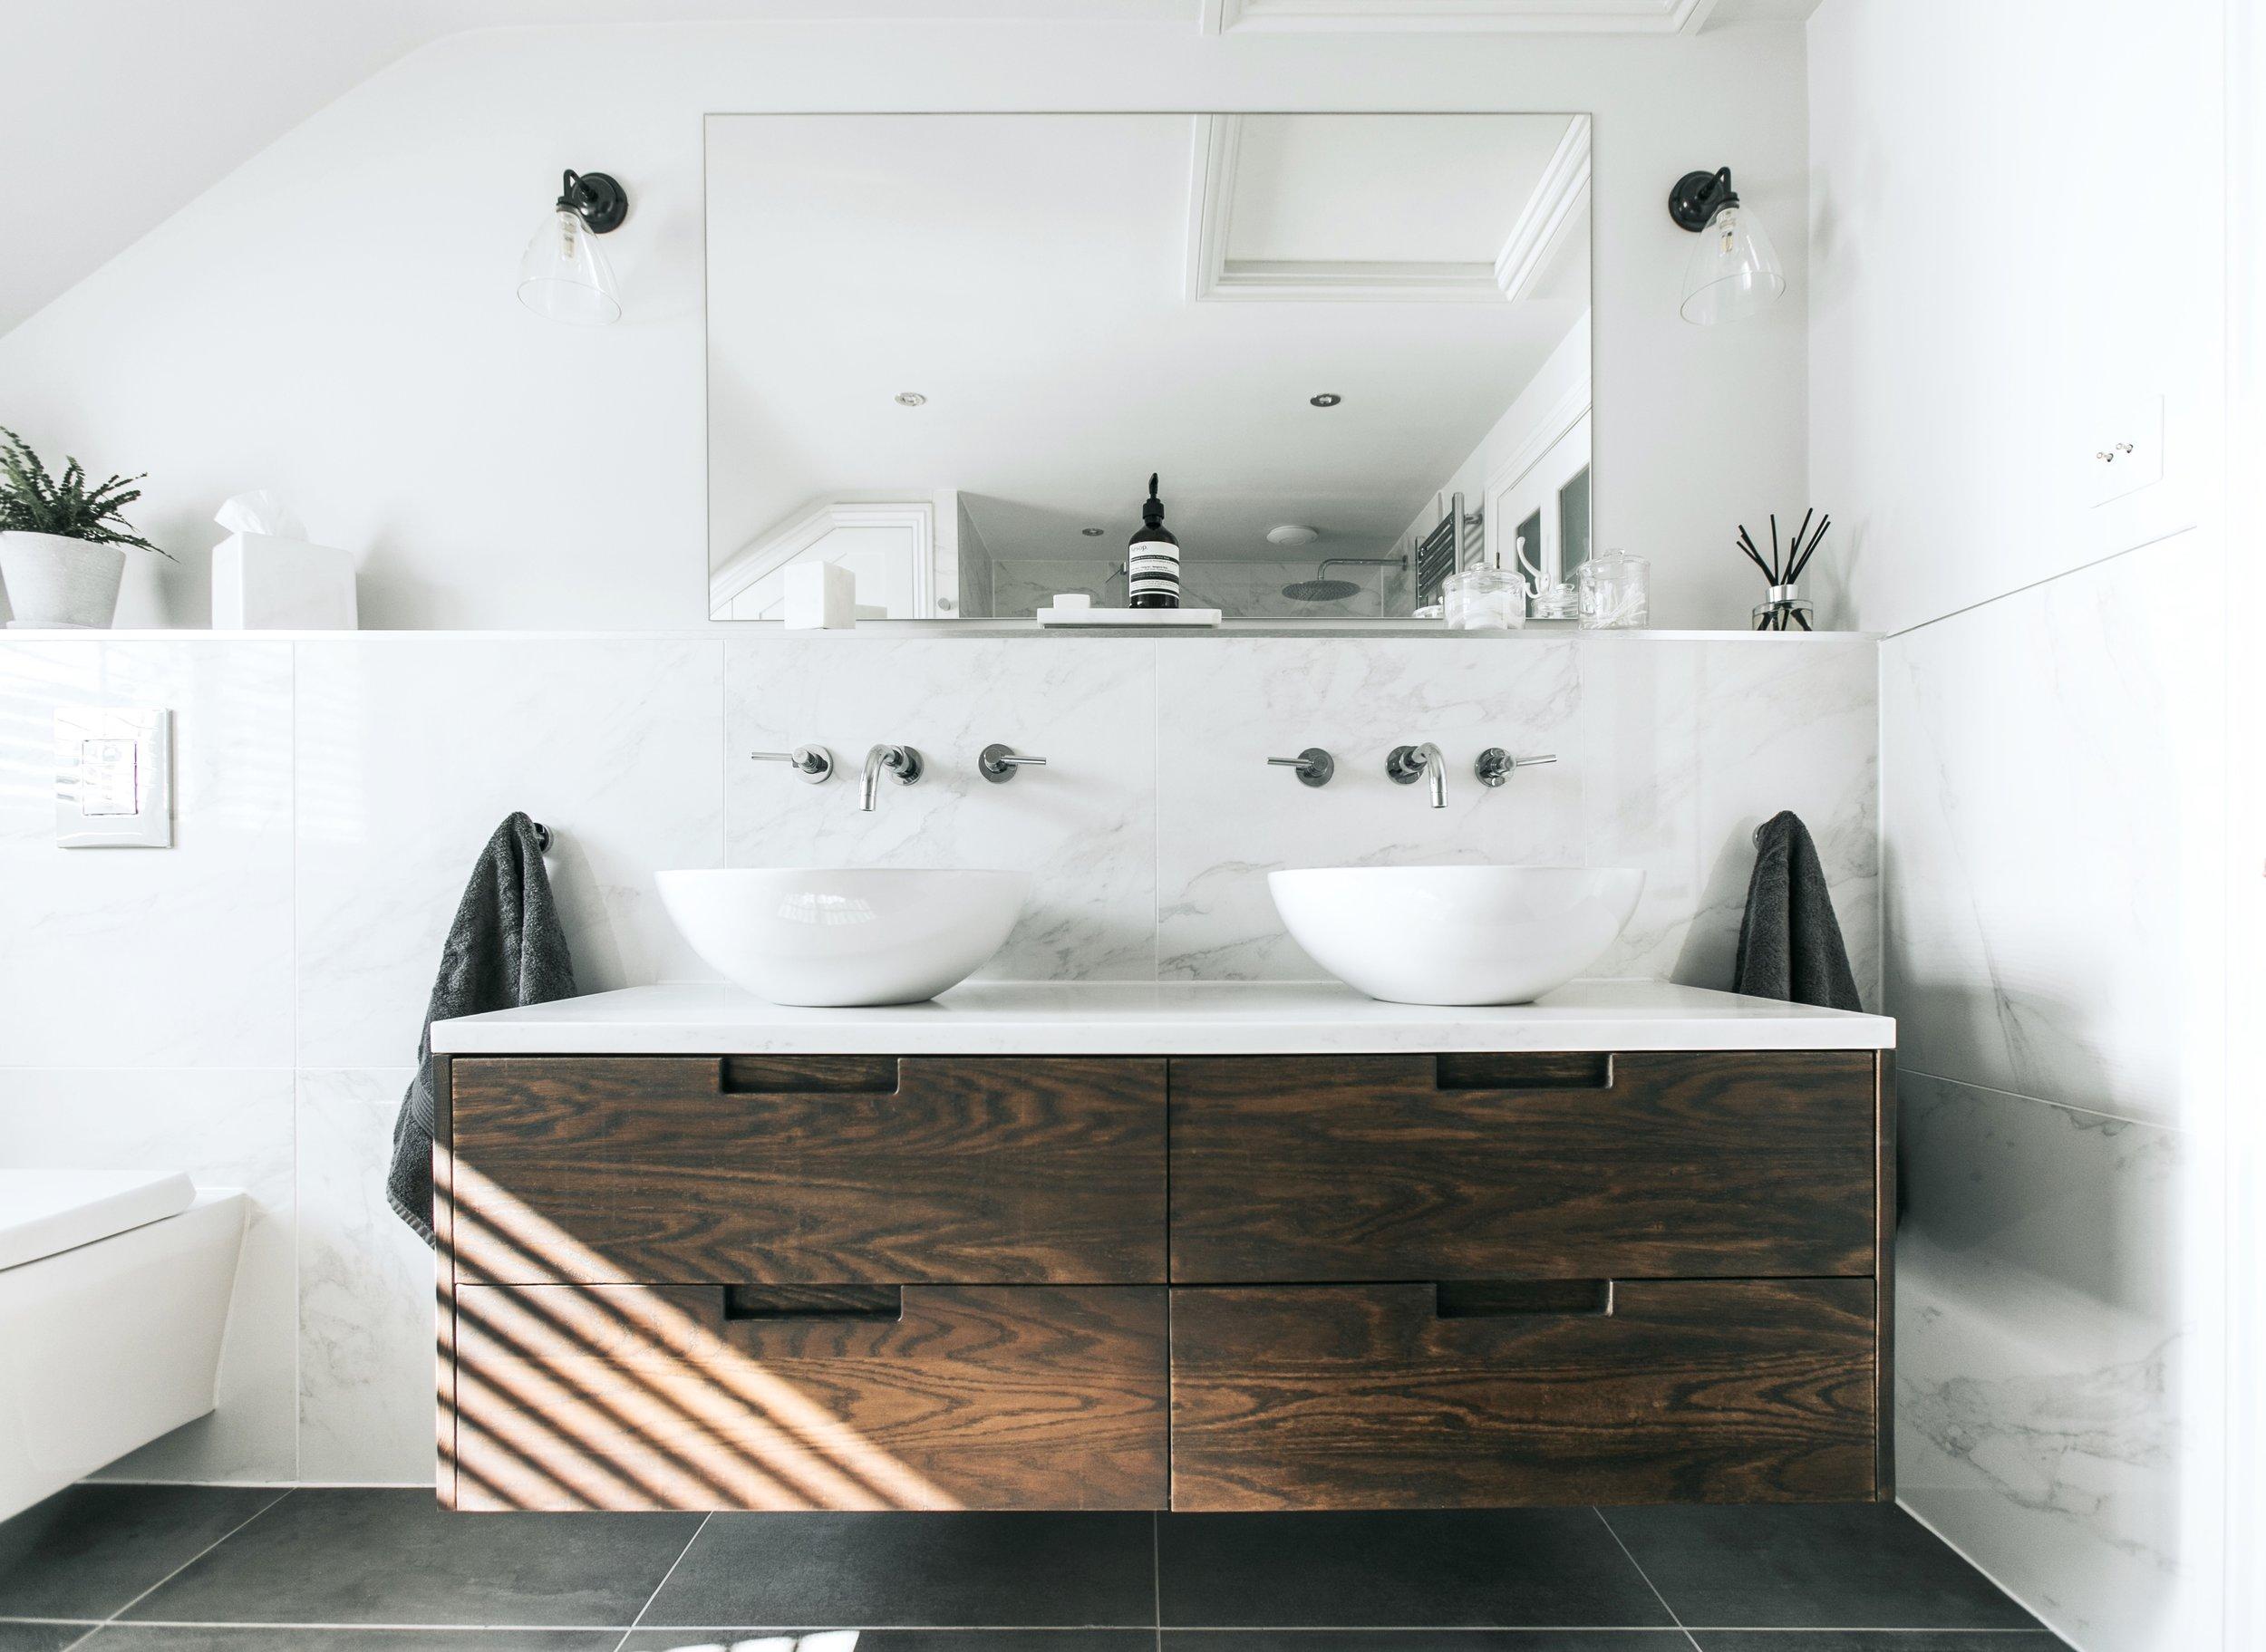 Contemporary Bathroom Remodel - See more